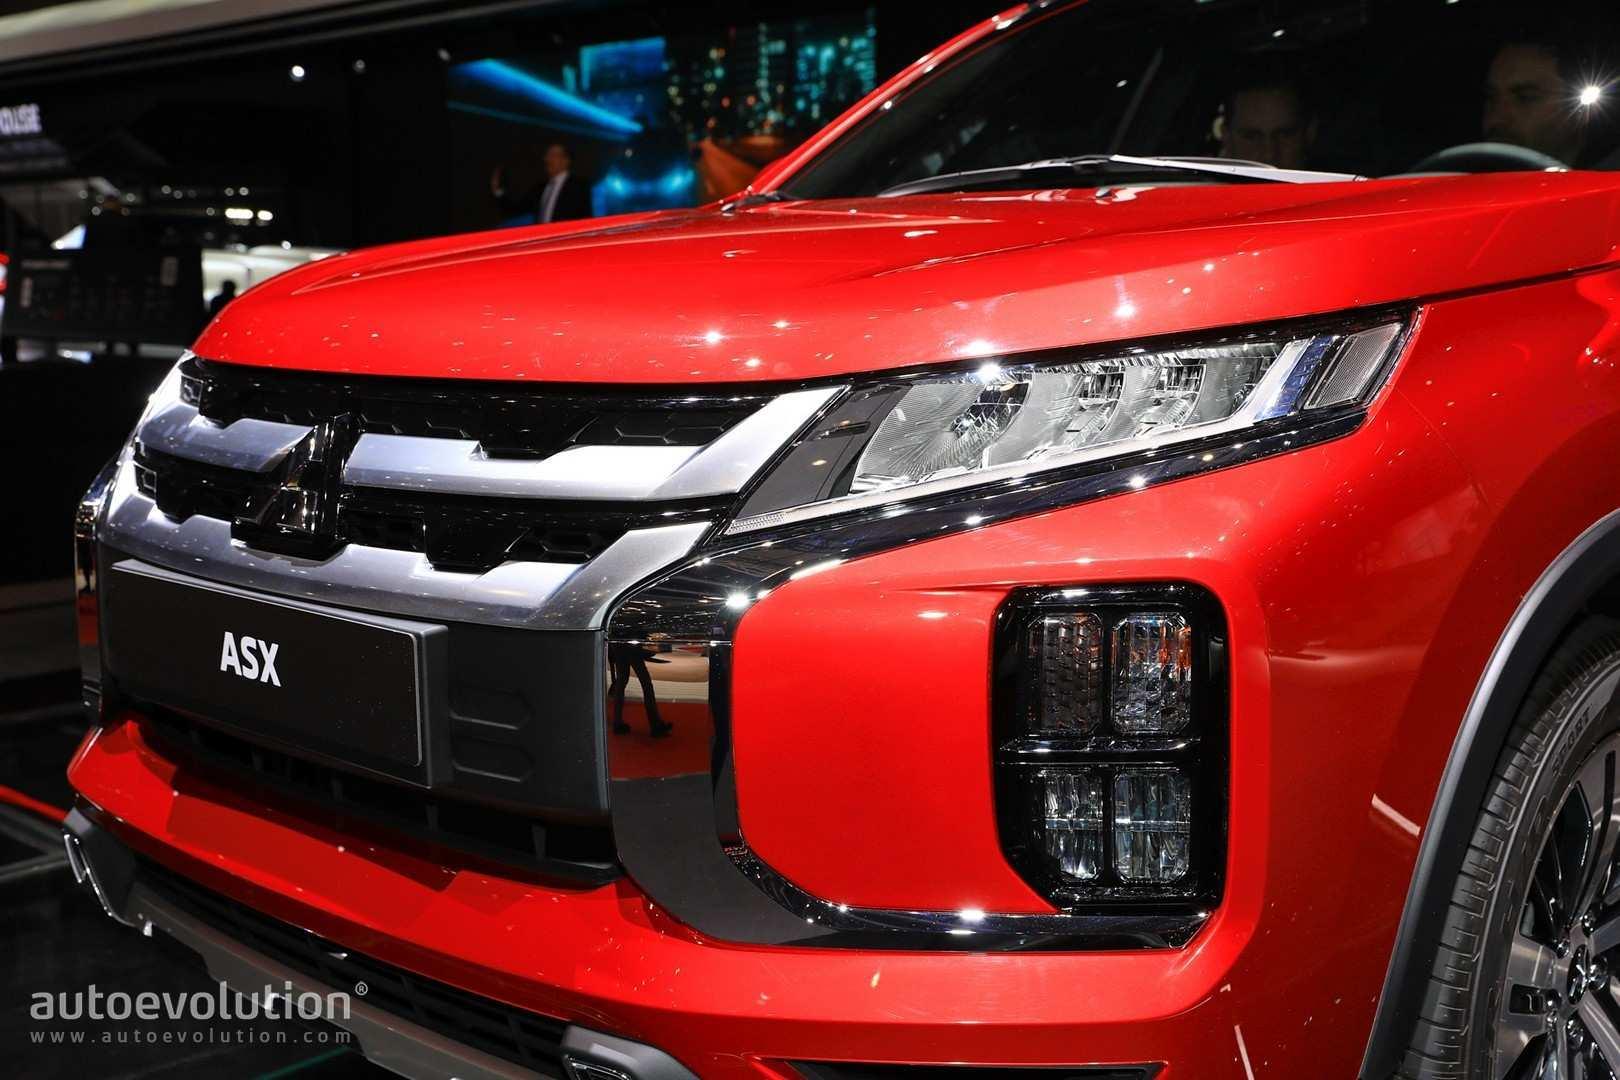 65 Concept of Mitsubishi Asx 2020 Uk Redesign and Concept for Mitsubishi Asx 2020 Uk